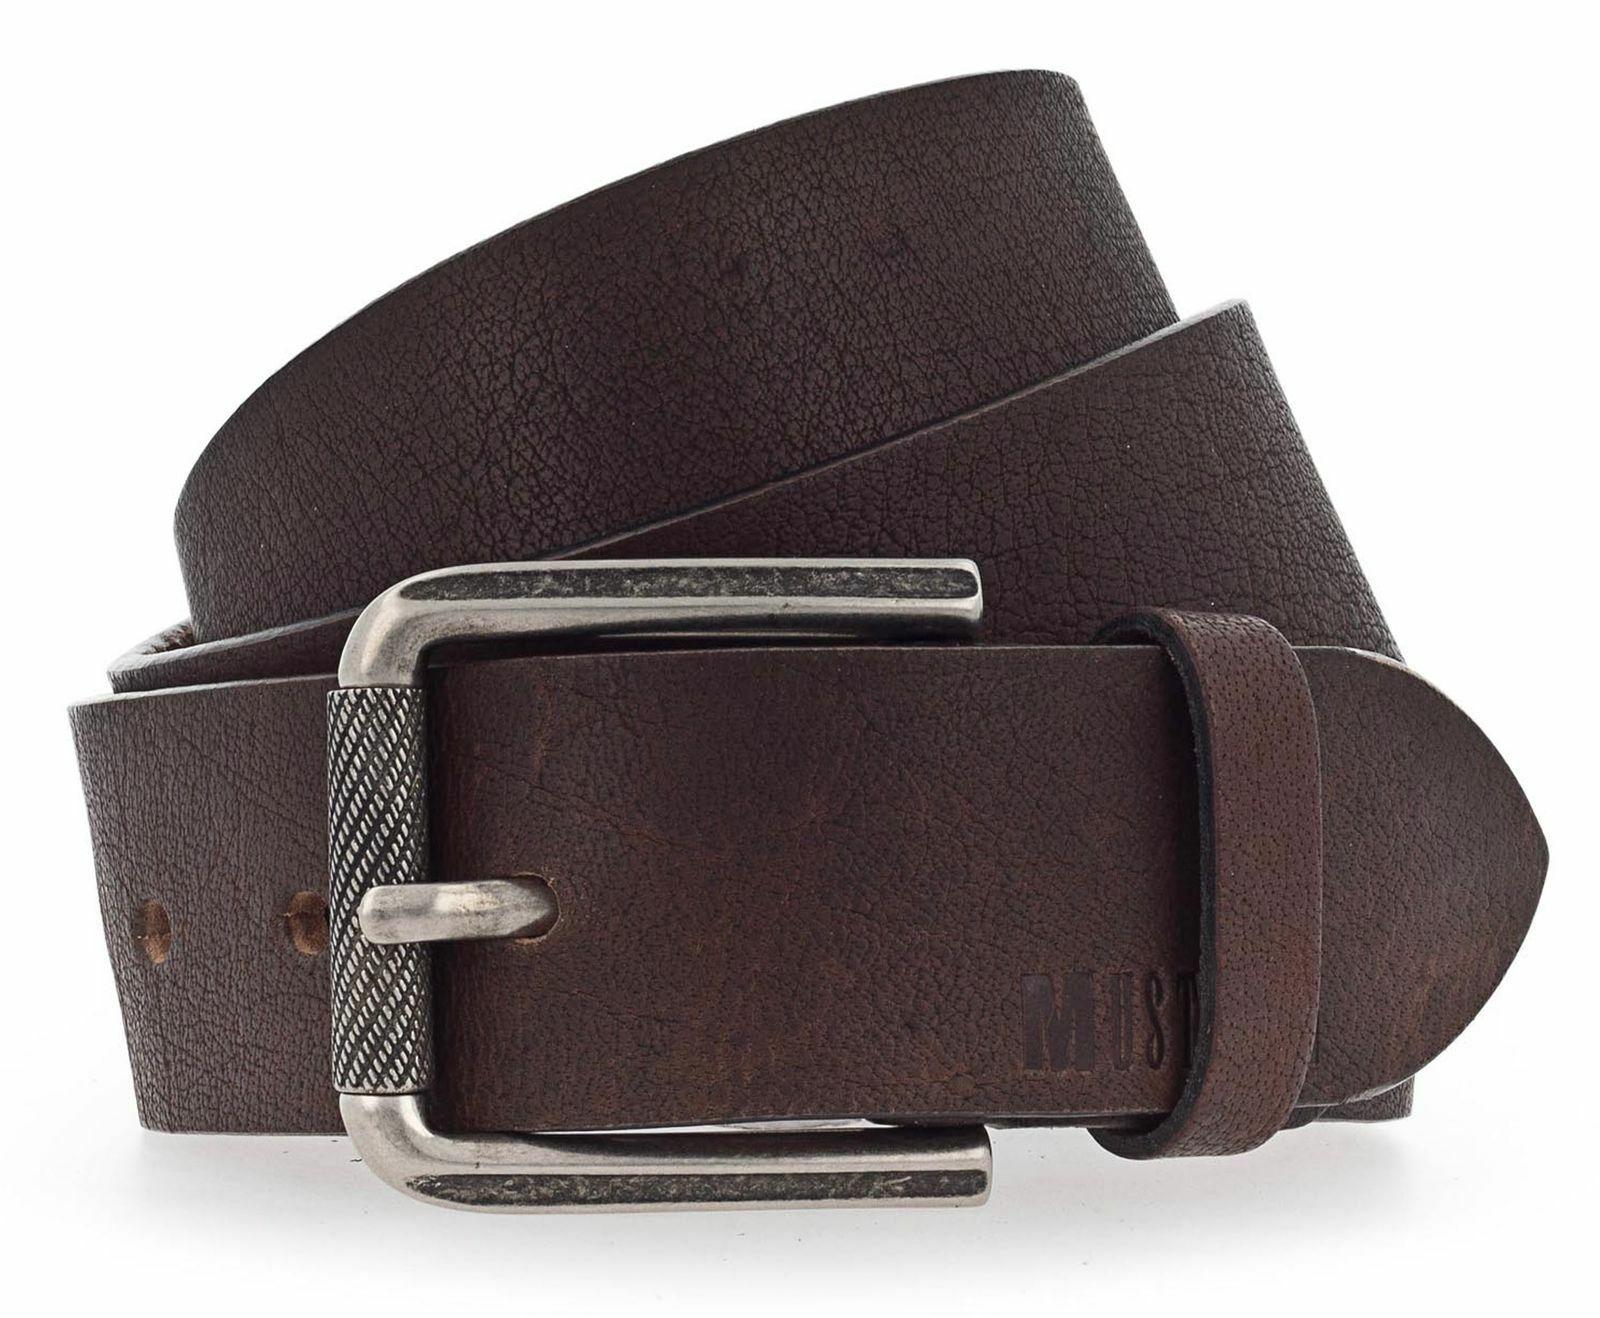 MUSTANG Adjustable Men´s Belt W85 Gürtel Accessoire Dark Brown Braun Neu